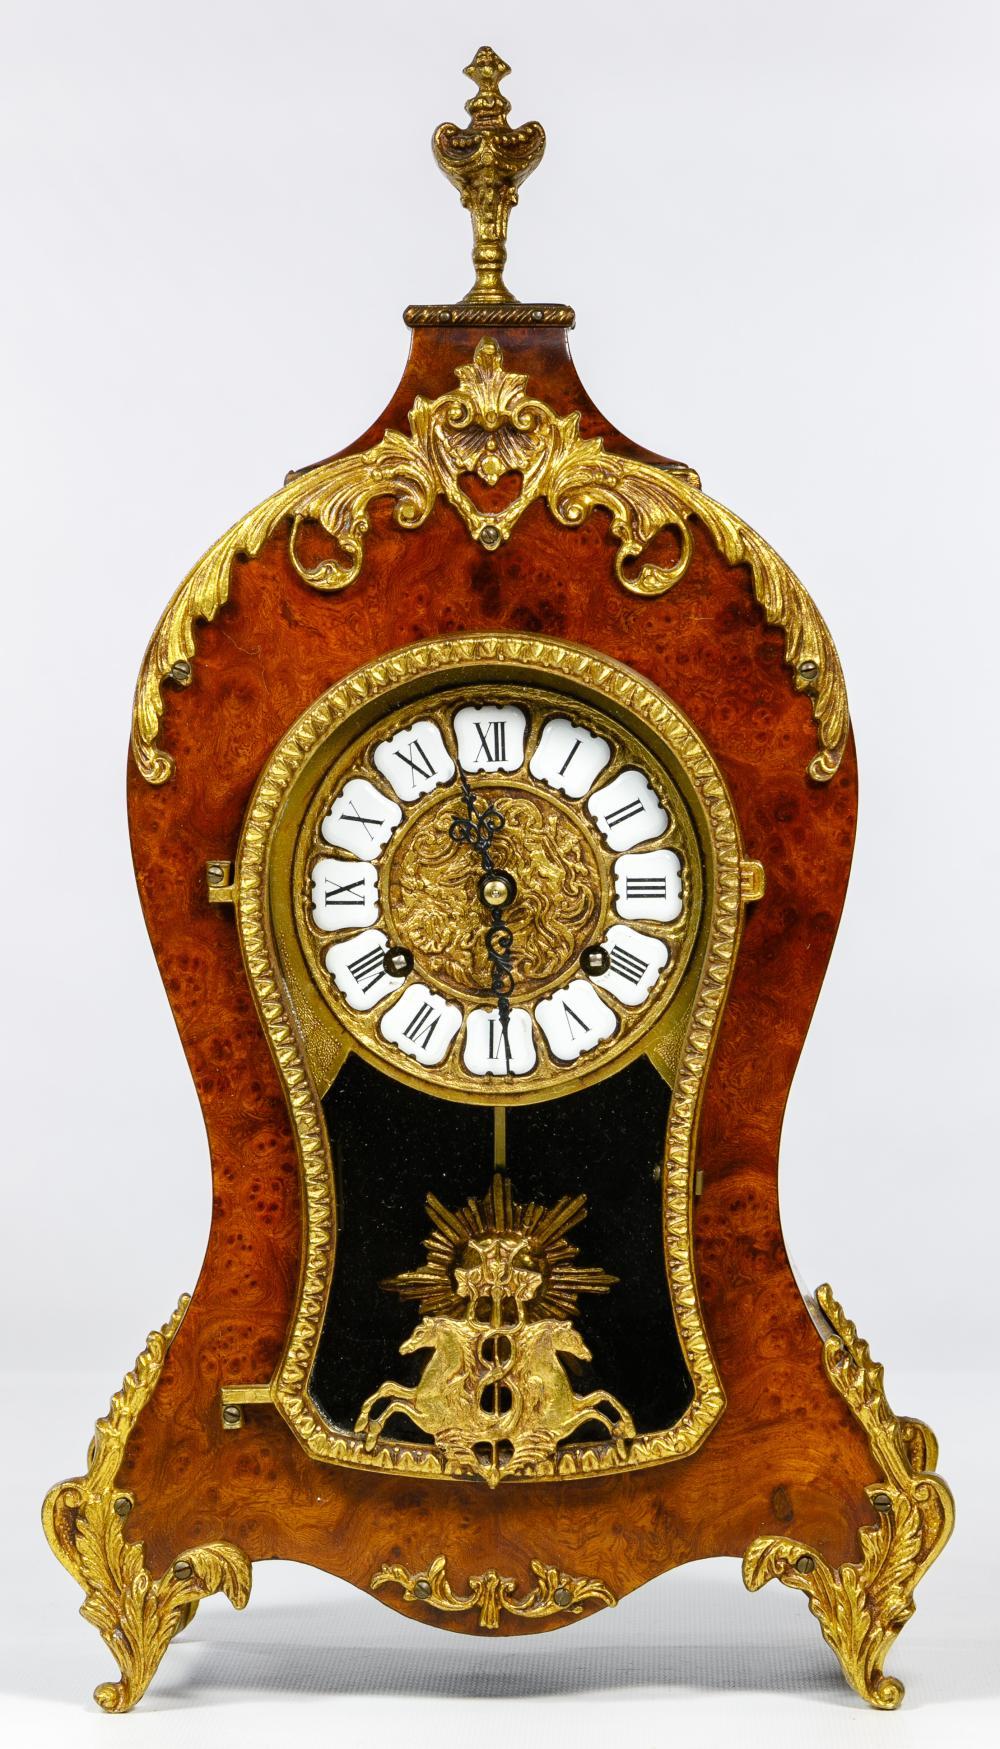 Bracket Clock Works by Hermle West Germany